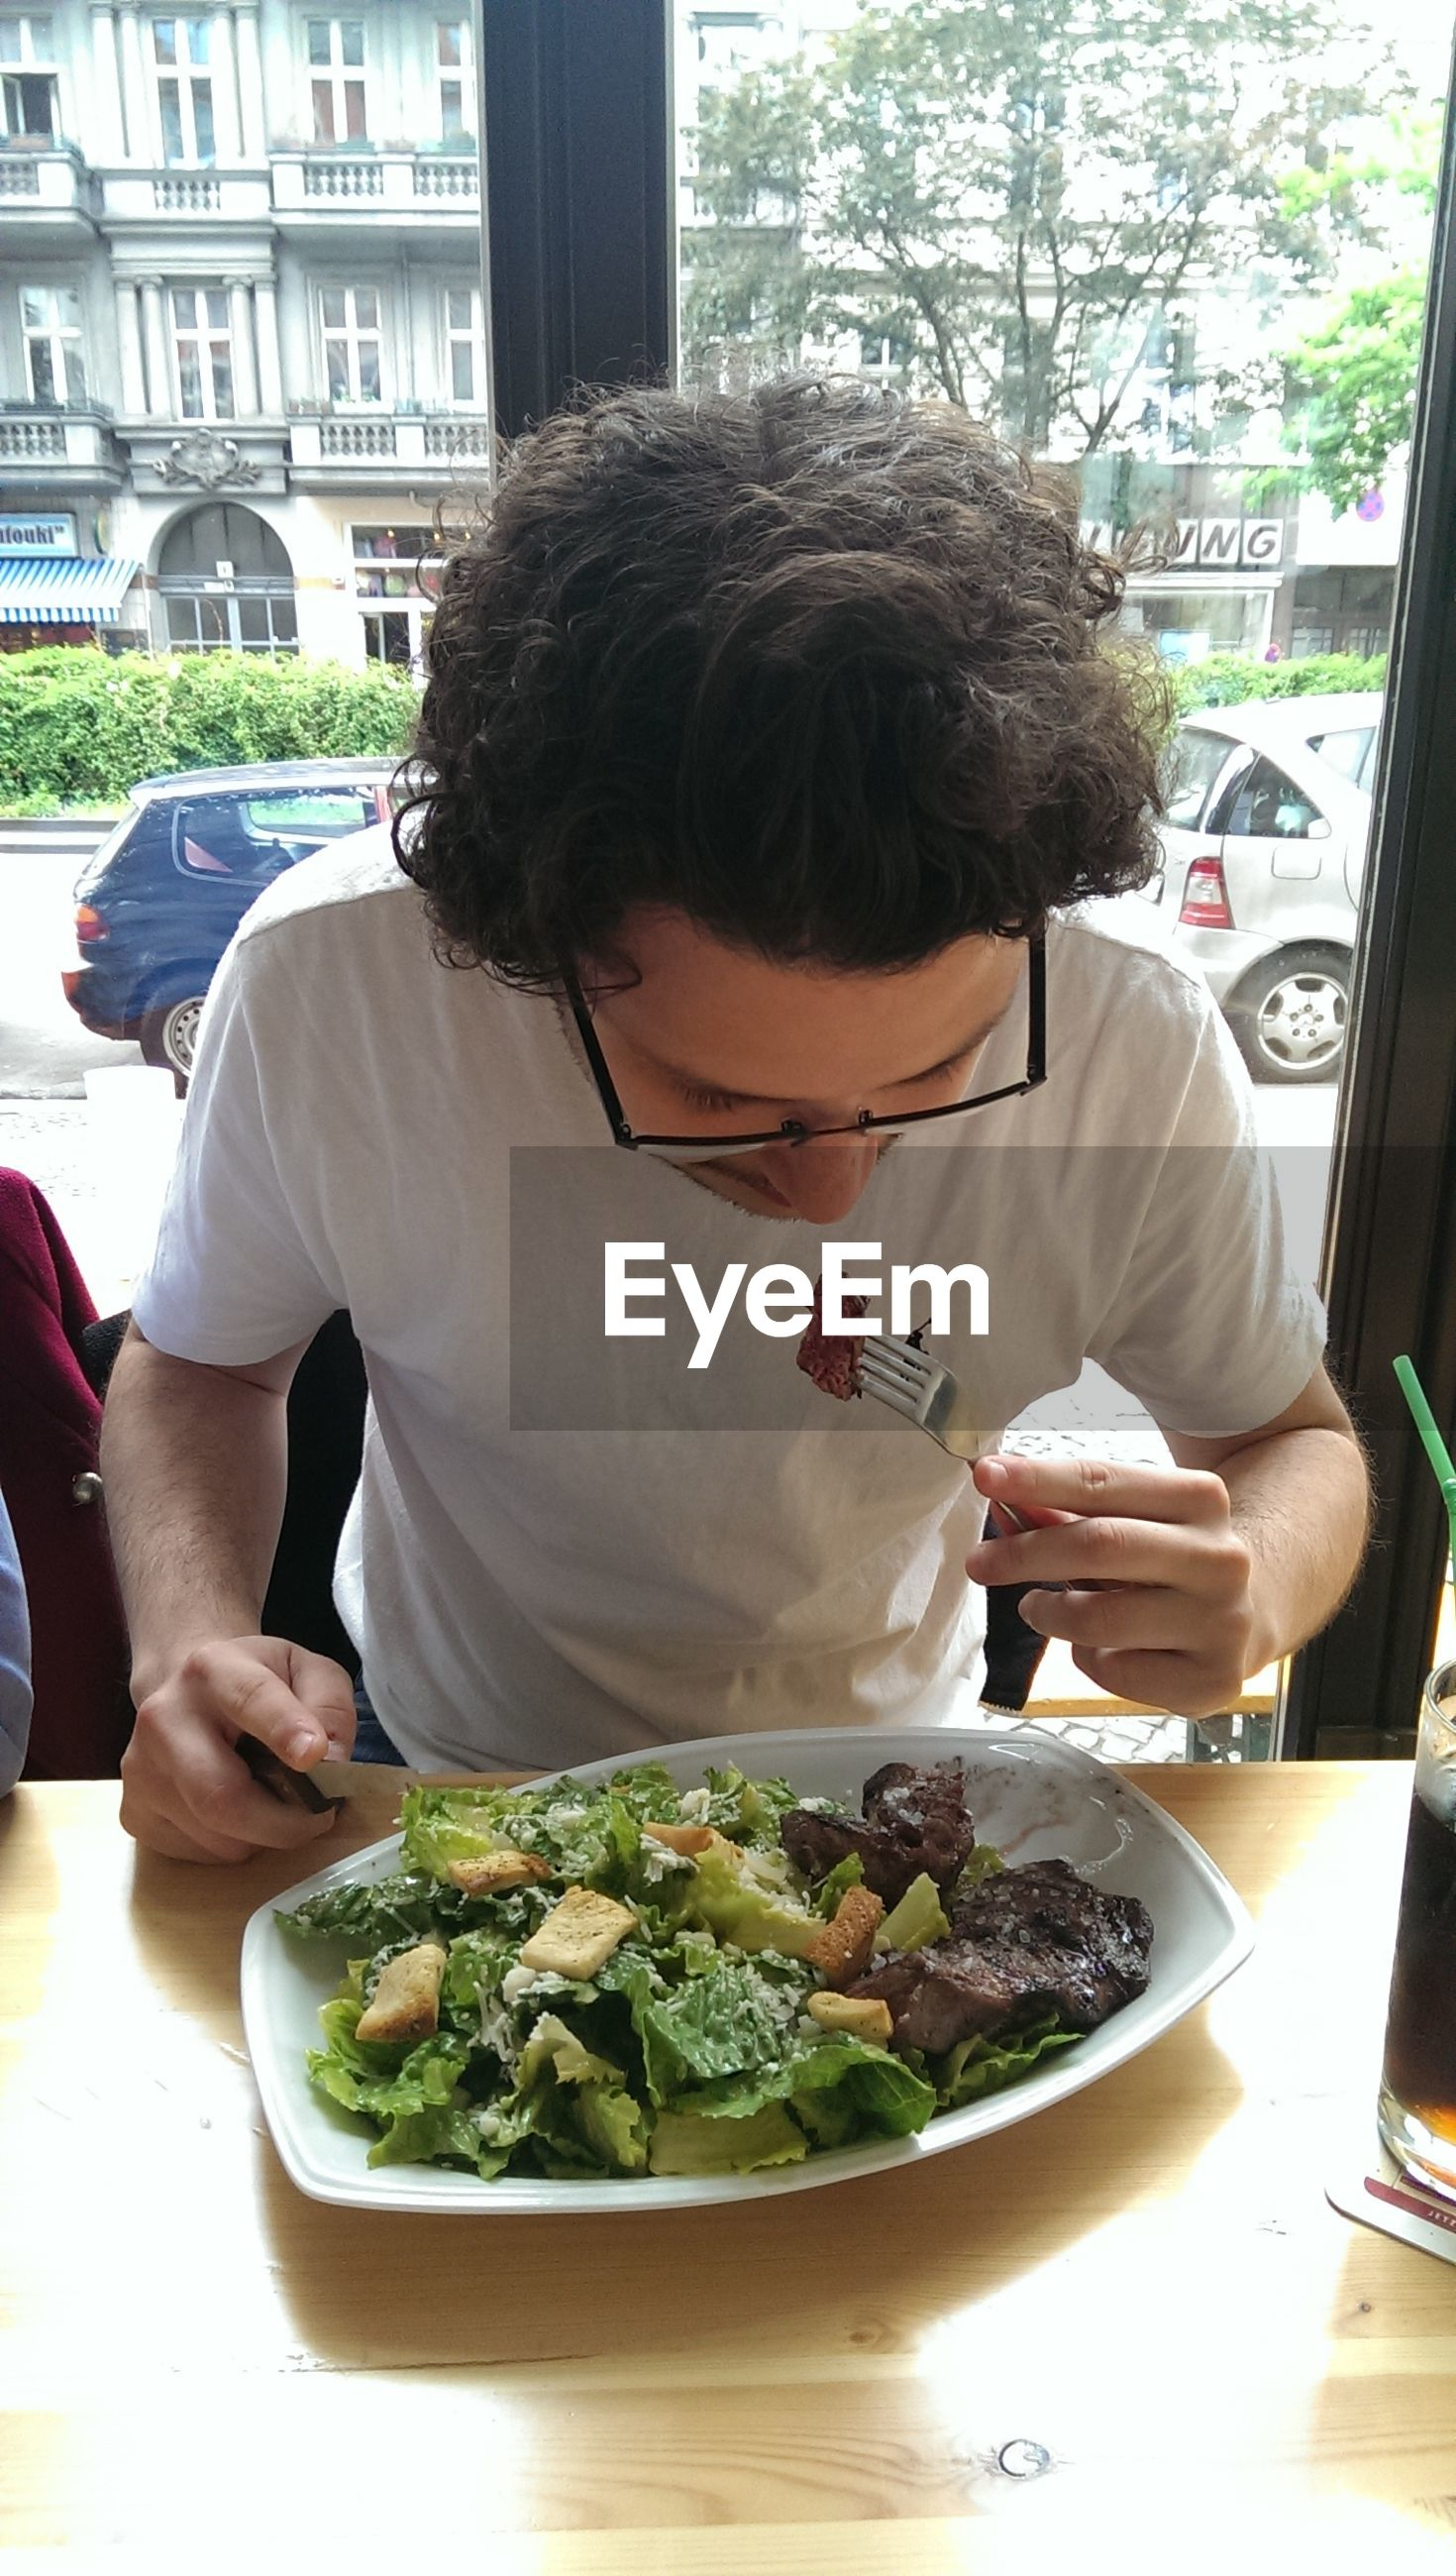 Man eating salad in restaurant